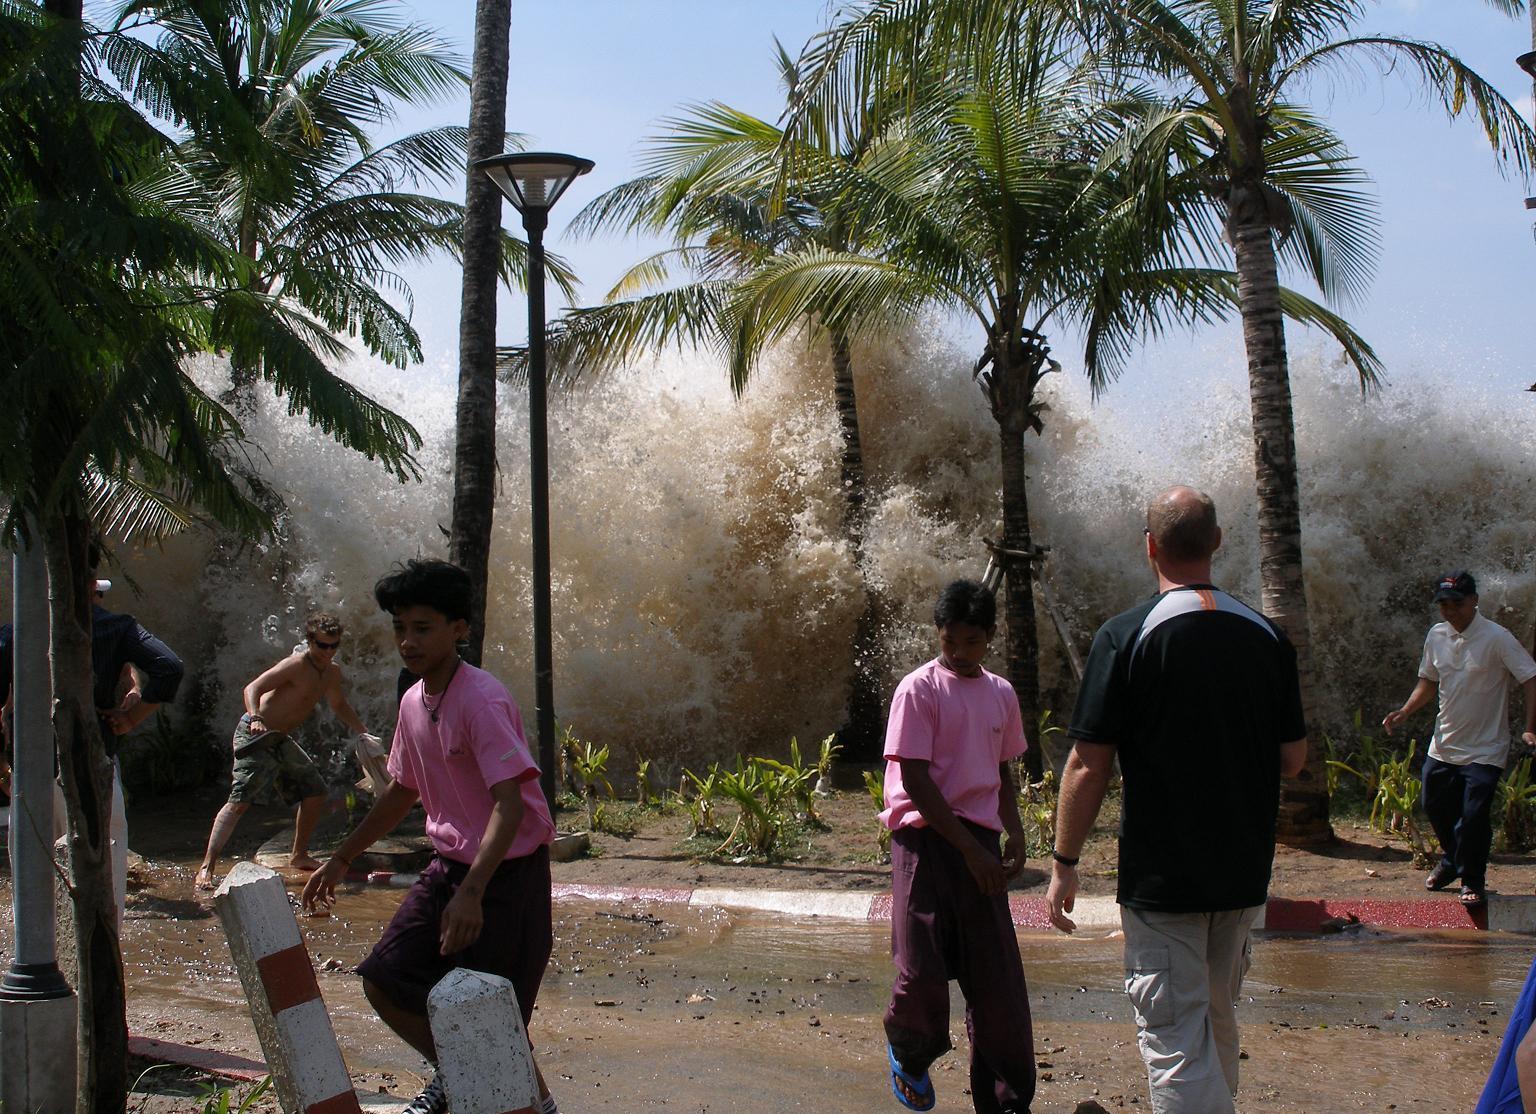 Indonesia tsunami clipart free library 2004 Indian Ocean earthquake and tsunami - Wikipedia clipart free library